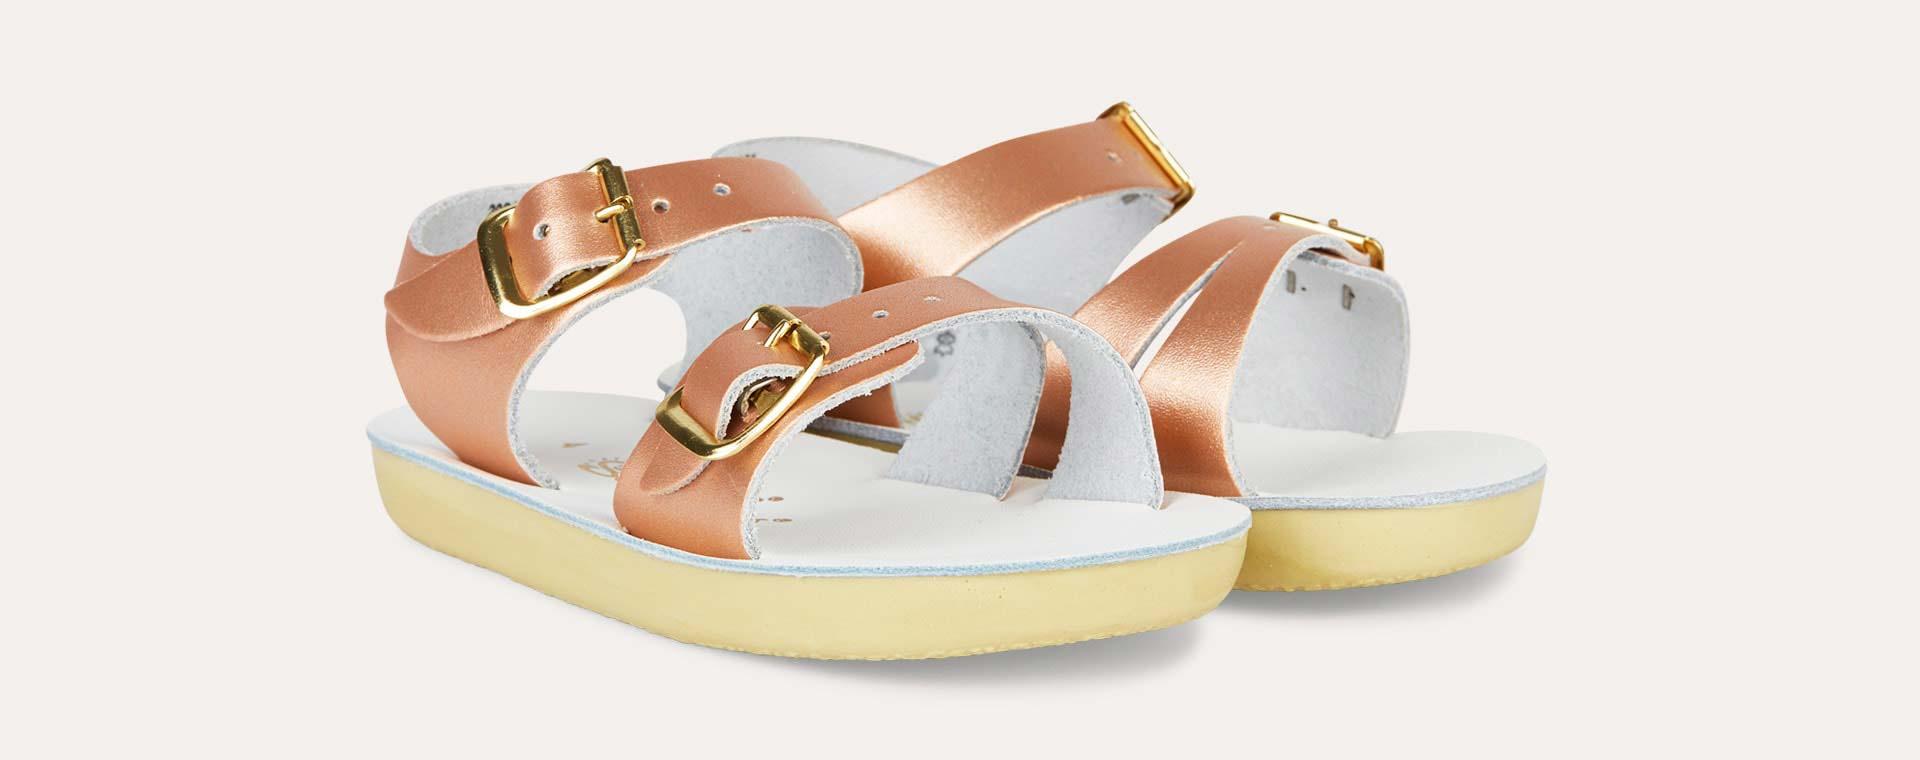 Rose Gold Salt-Water Sandals Seawee Sandal